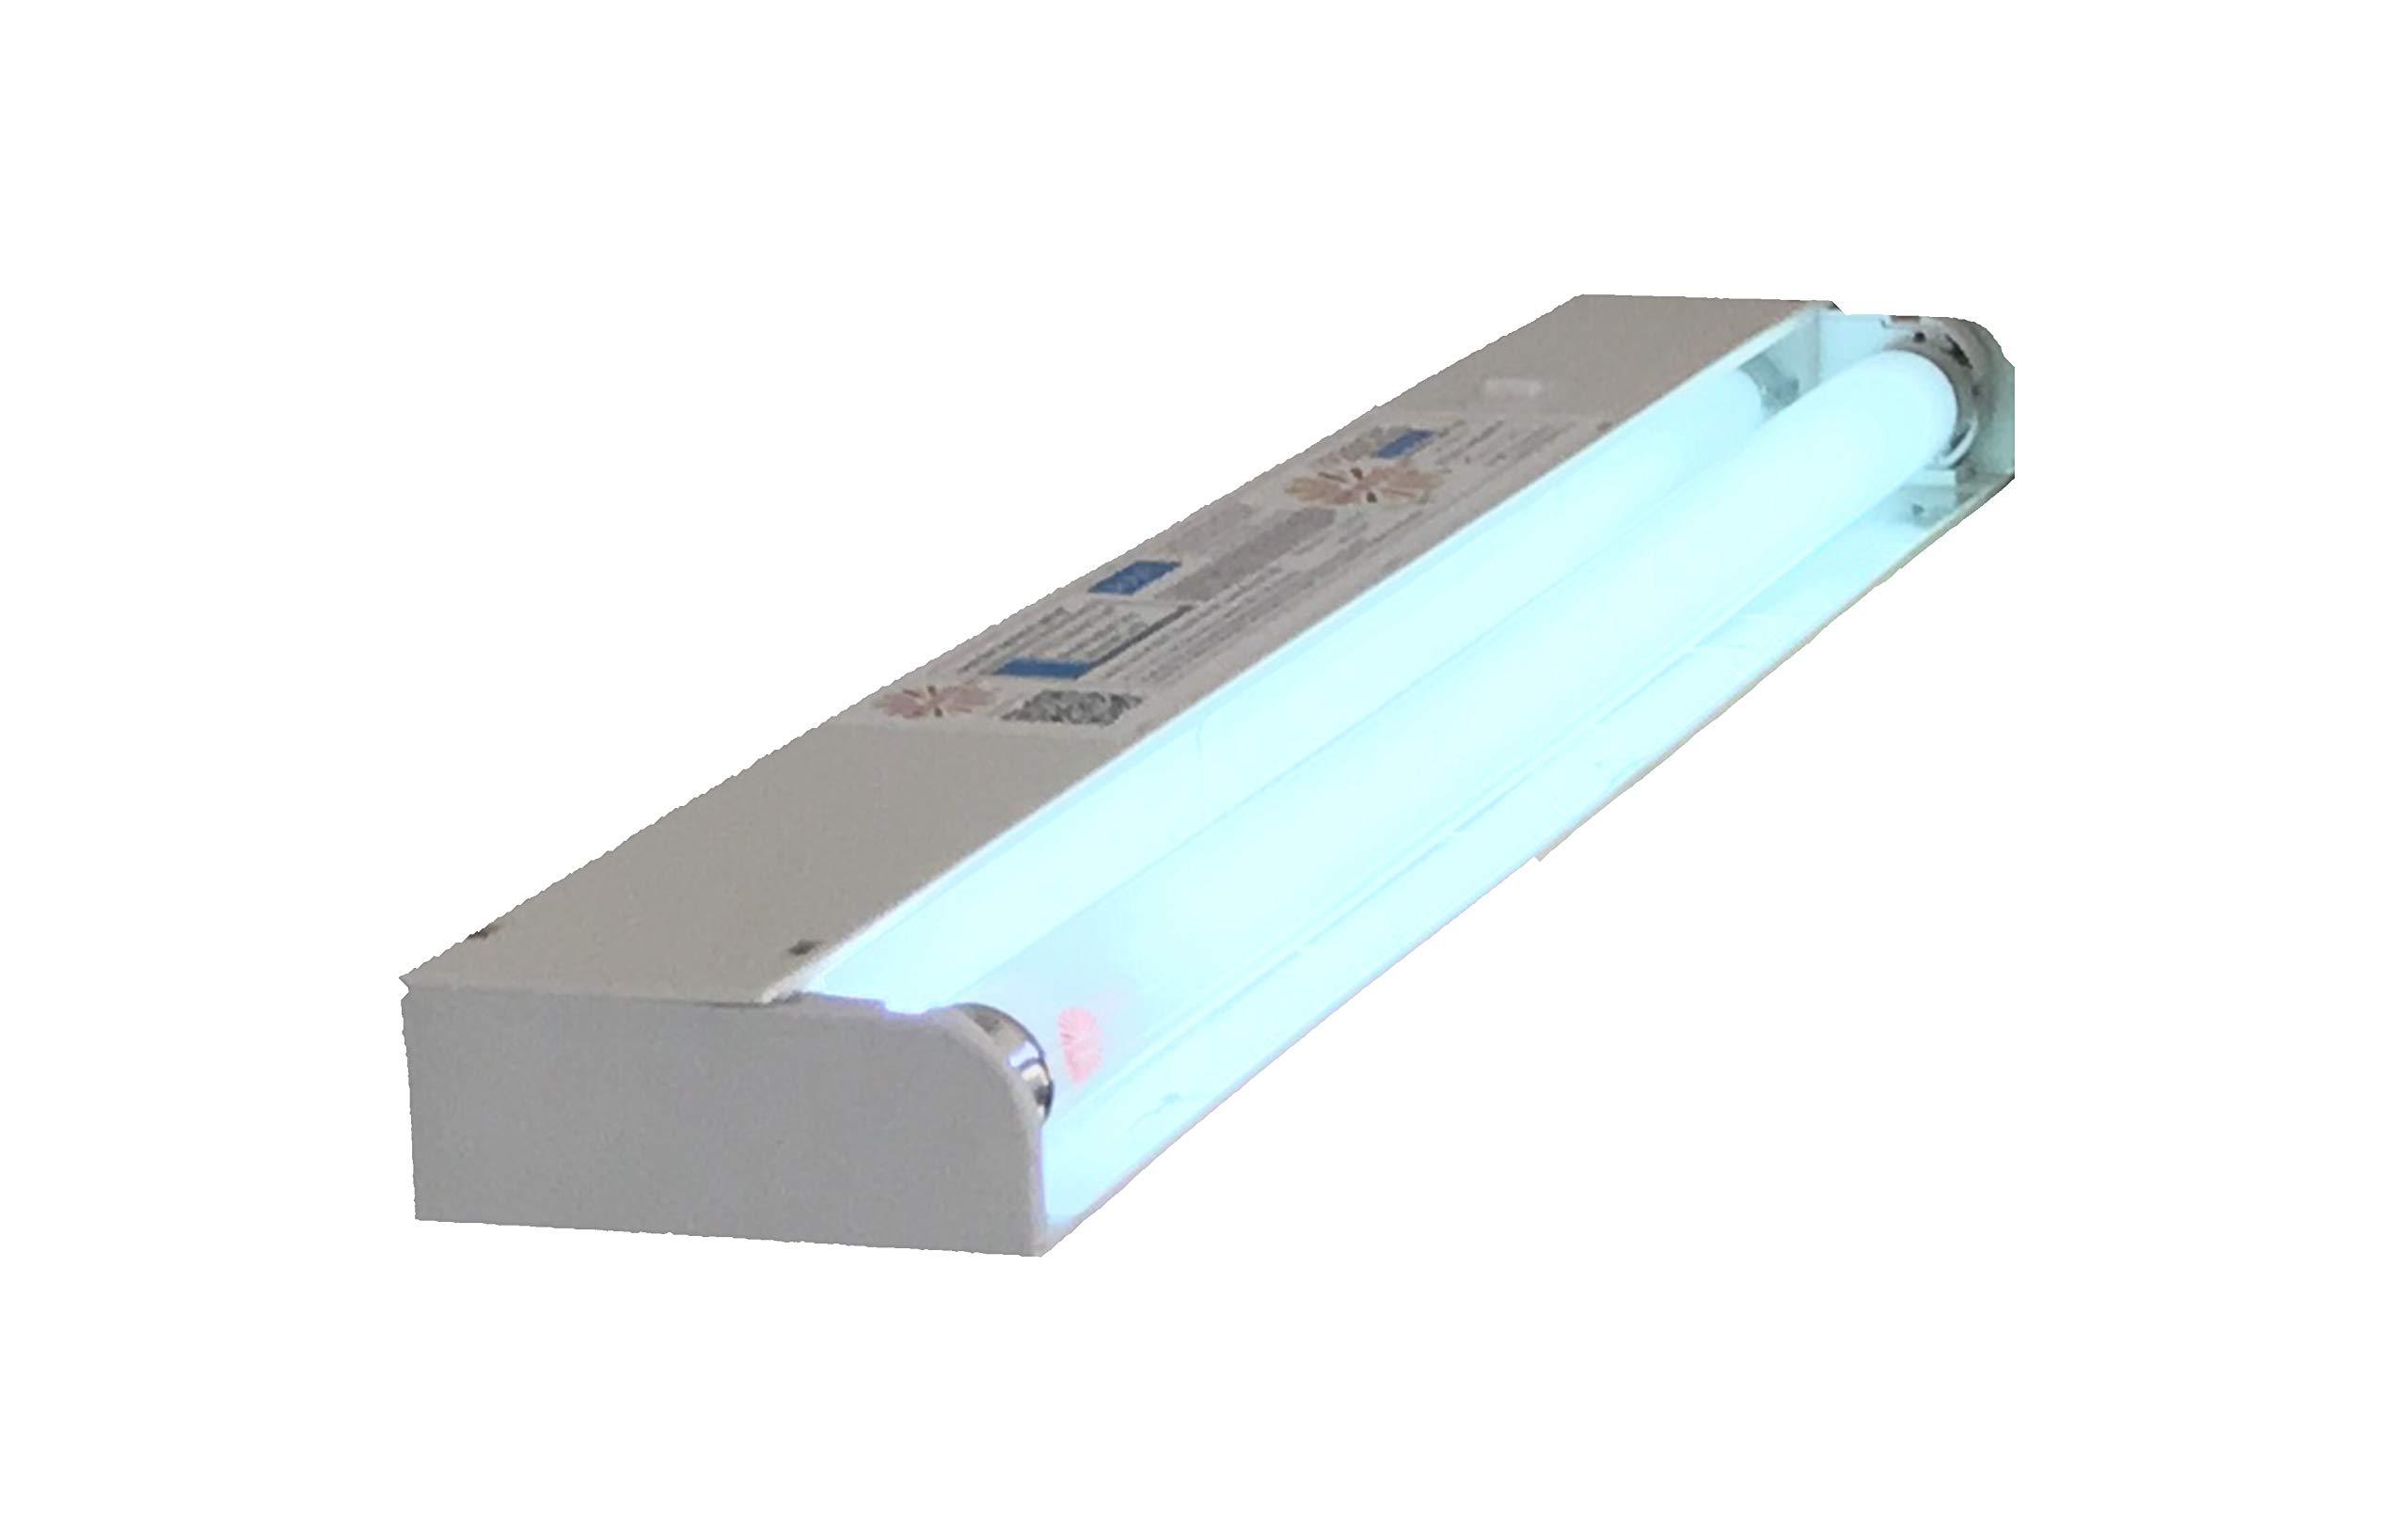 UVB Tropical White Ultraviolet BlueSky Lamp Model 1